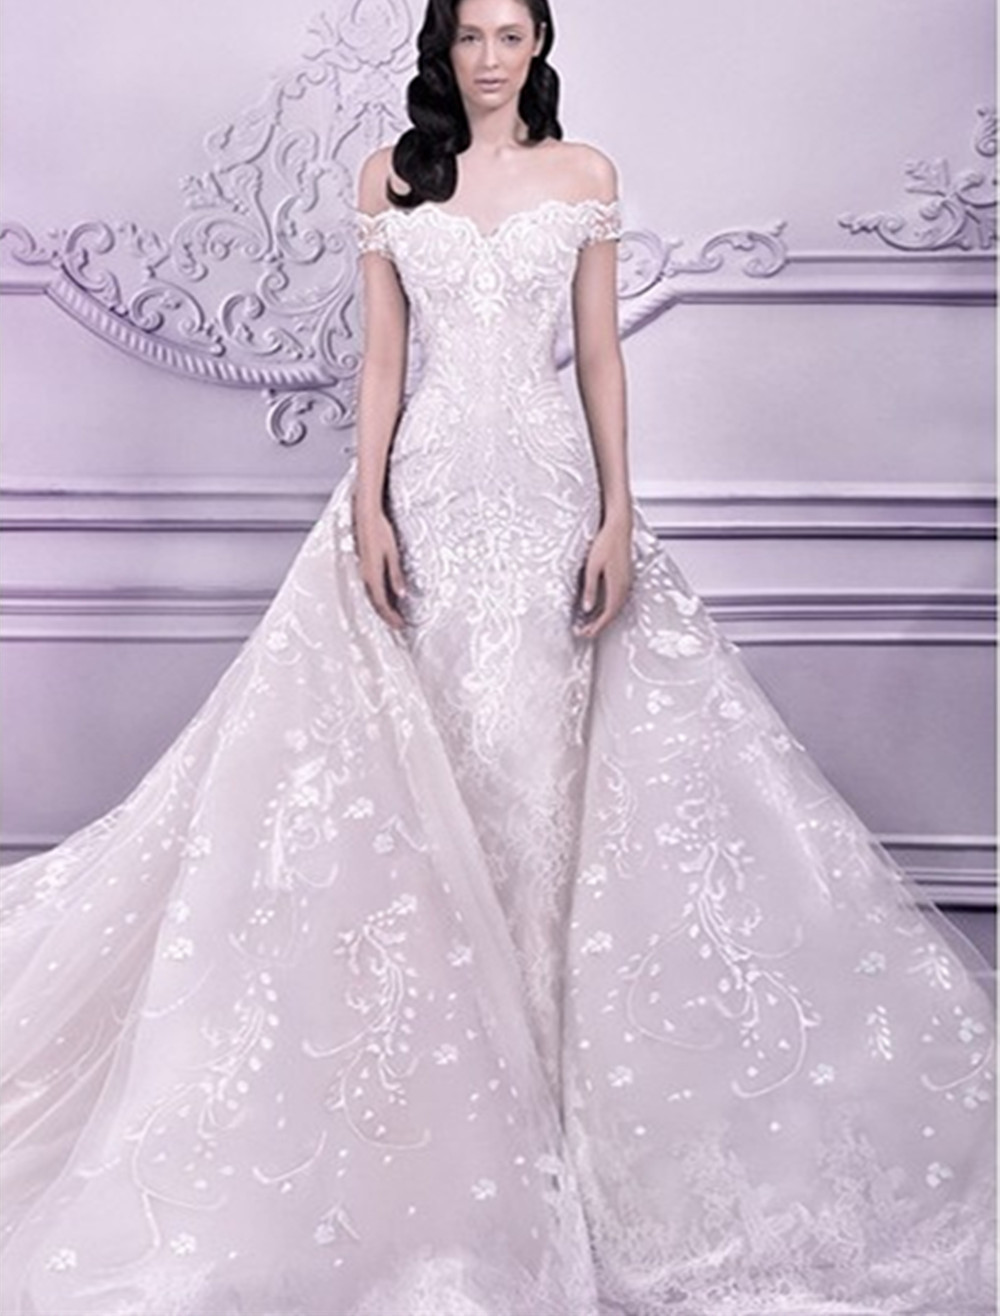 Expensive Bridal Gowns Online Flower Girl Dresses